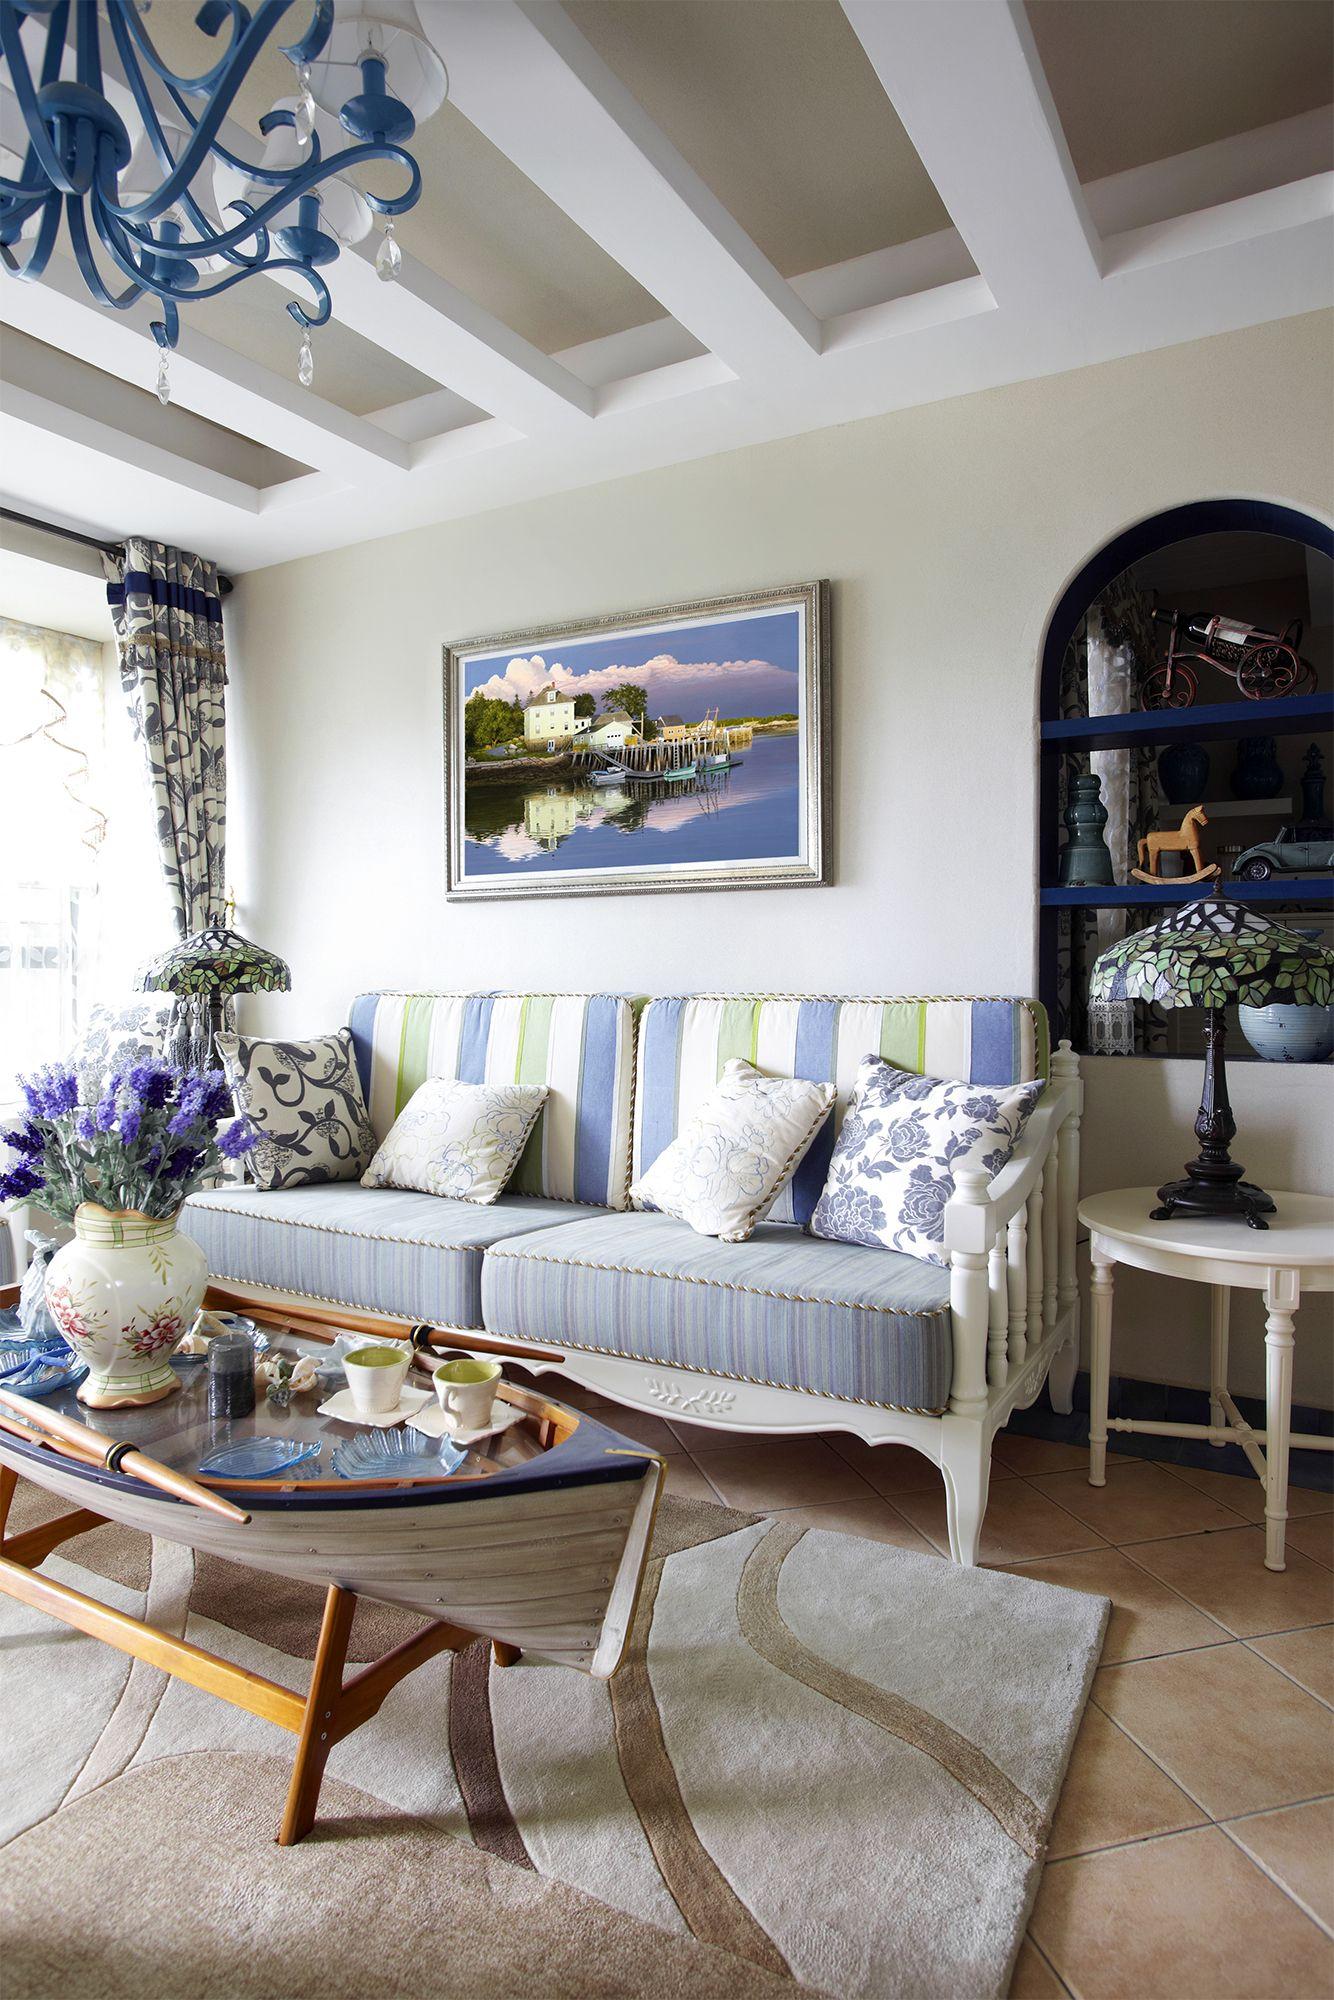 Home interior design accessories coastal home interior design artwork by alexander volkov at art